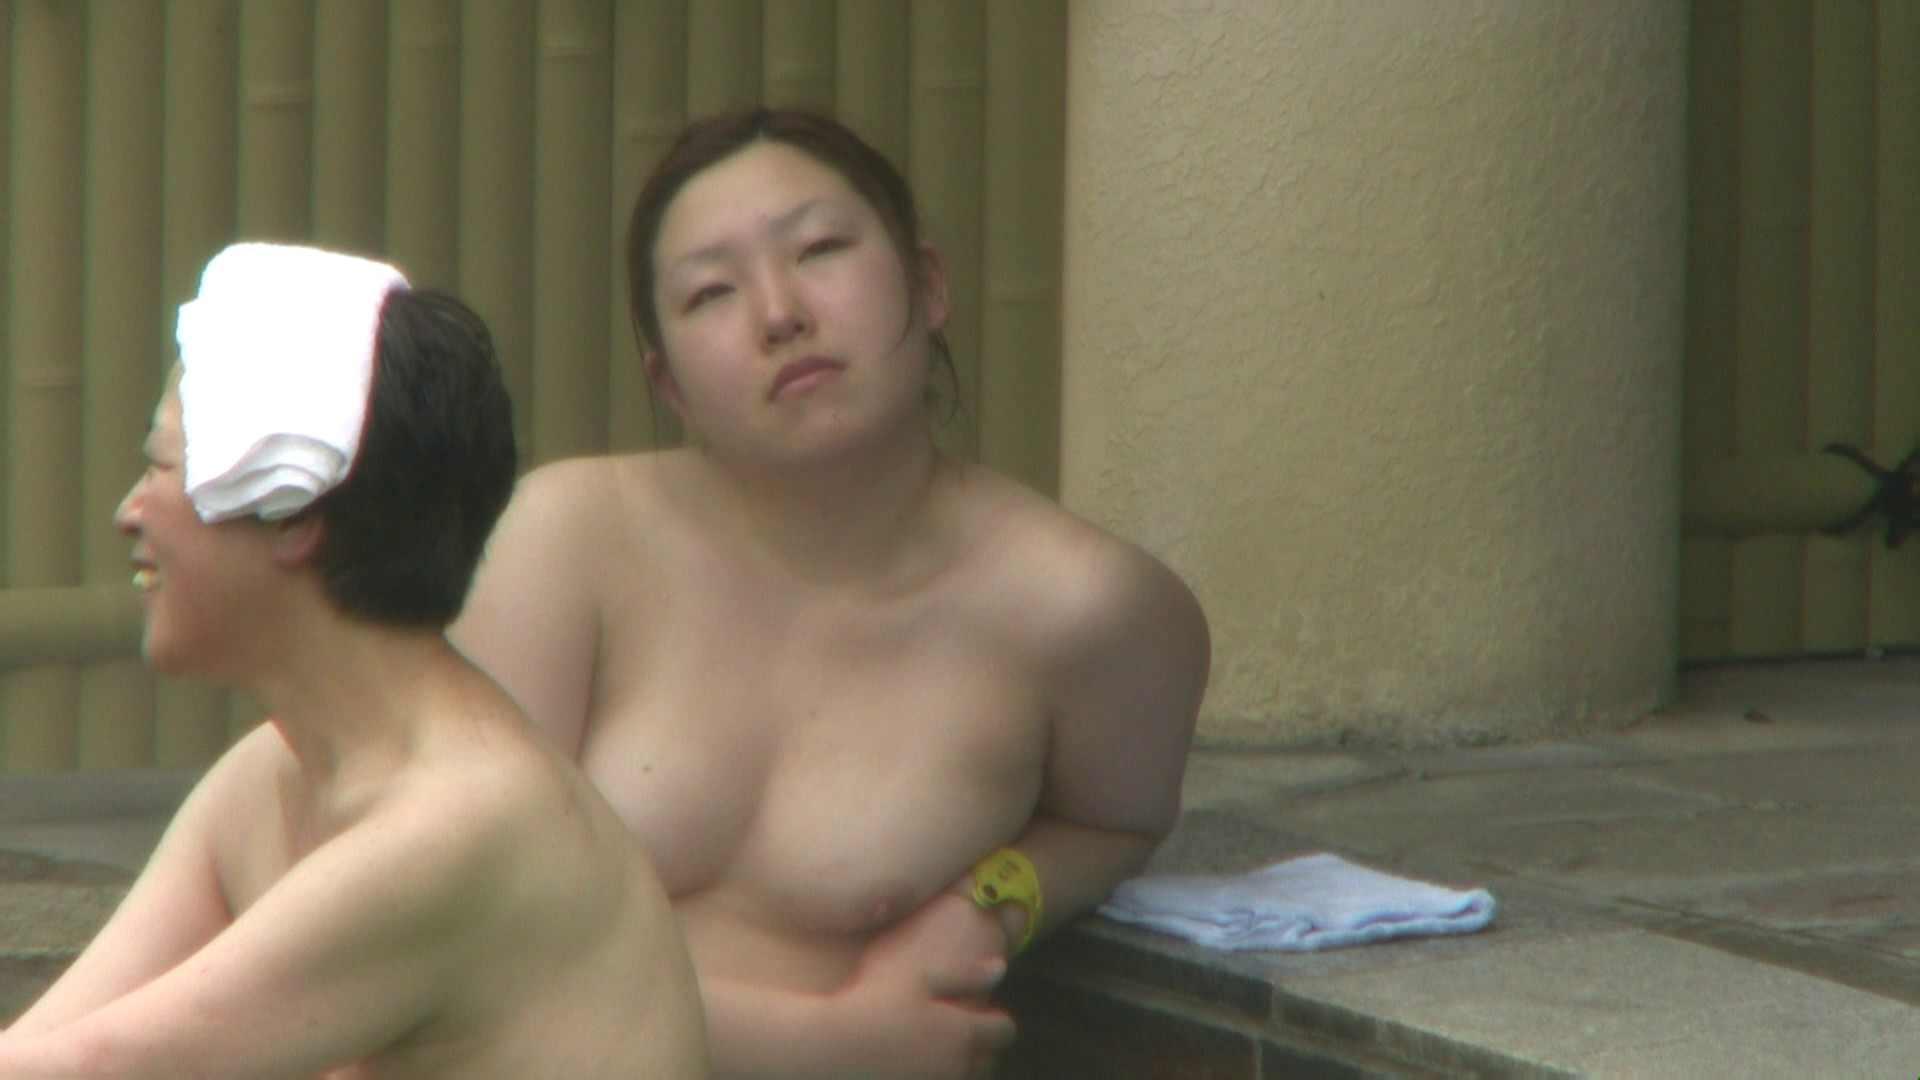 Aquaな露天風呂Vol.72【VIP限定】 0  47連発 16